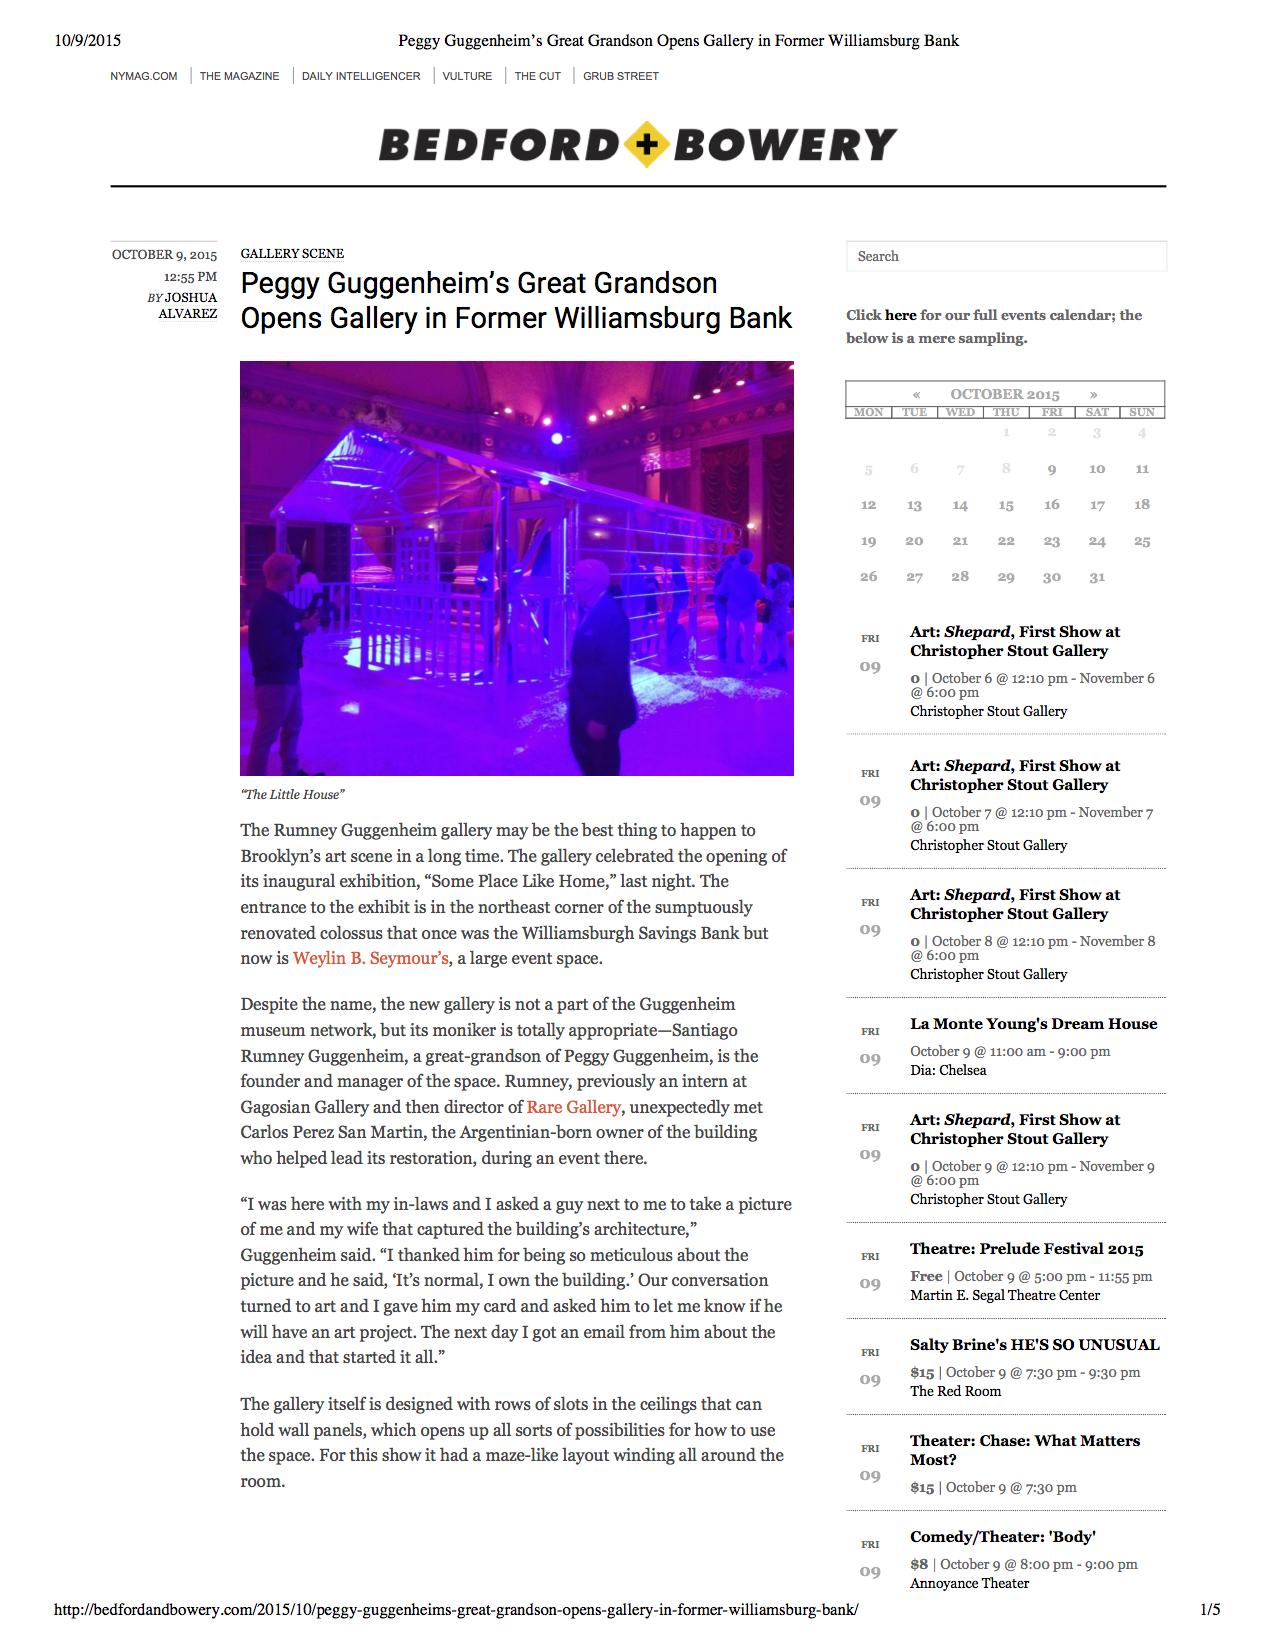 Peggy Guggenheim's Great Grandson Opens Gallery in Former Williamsburg Bank.jpg